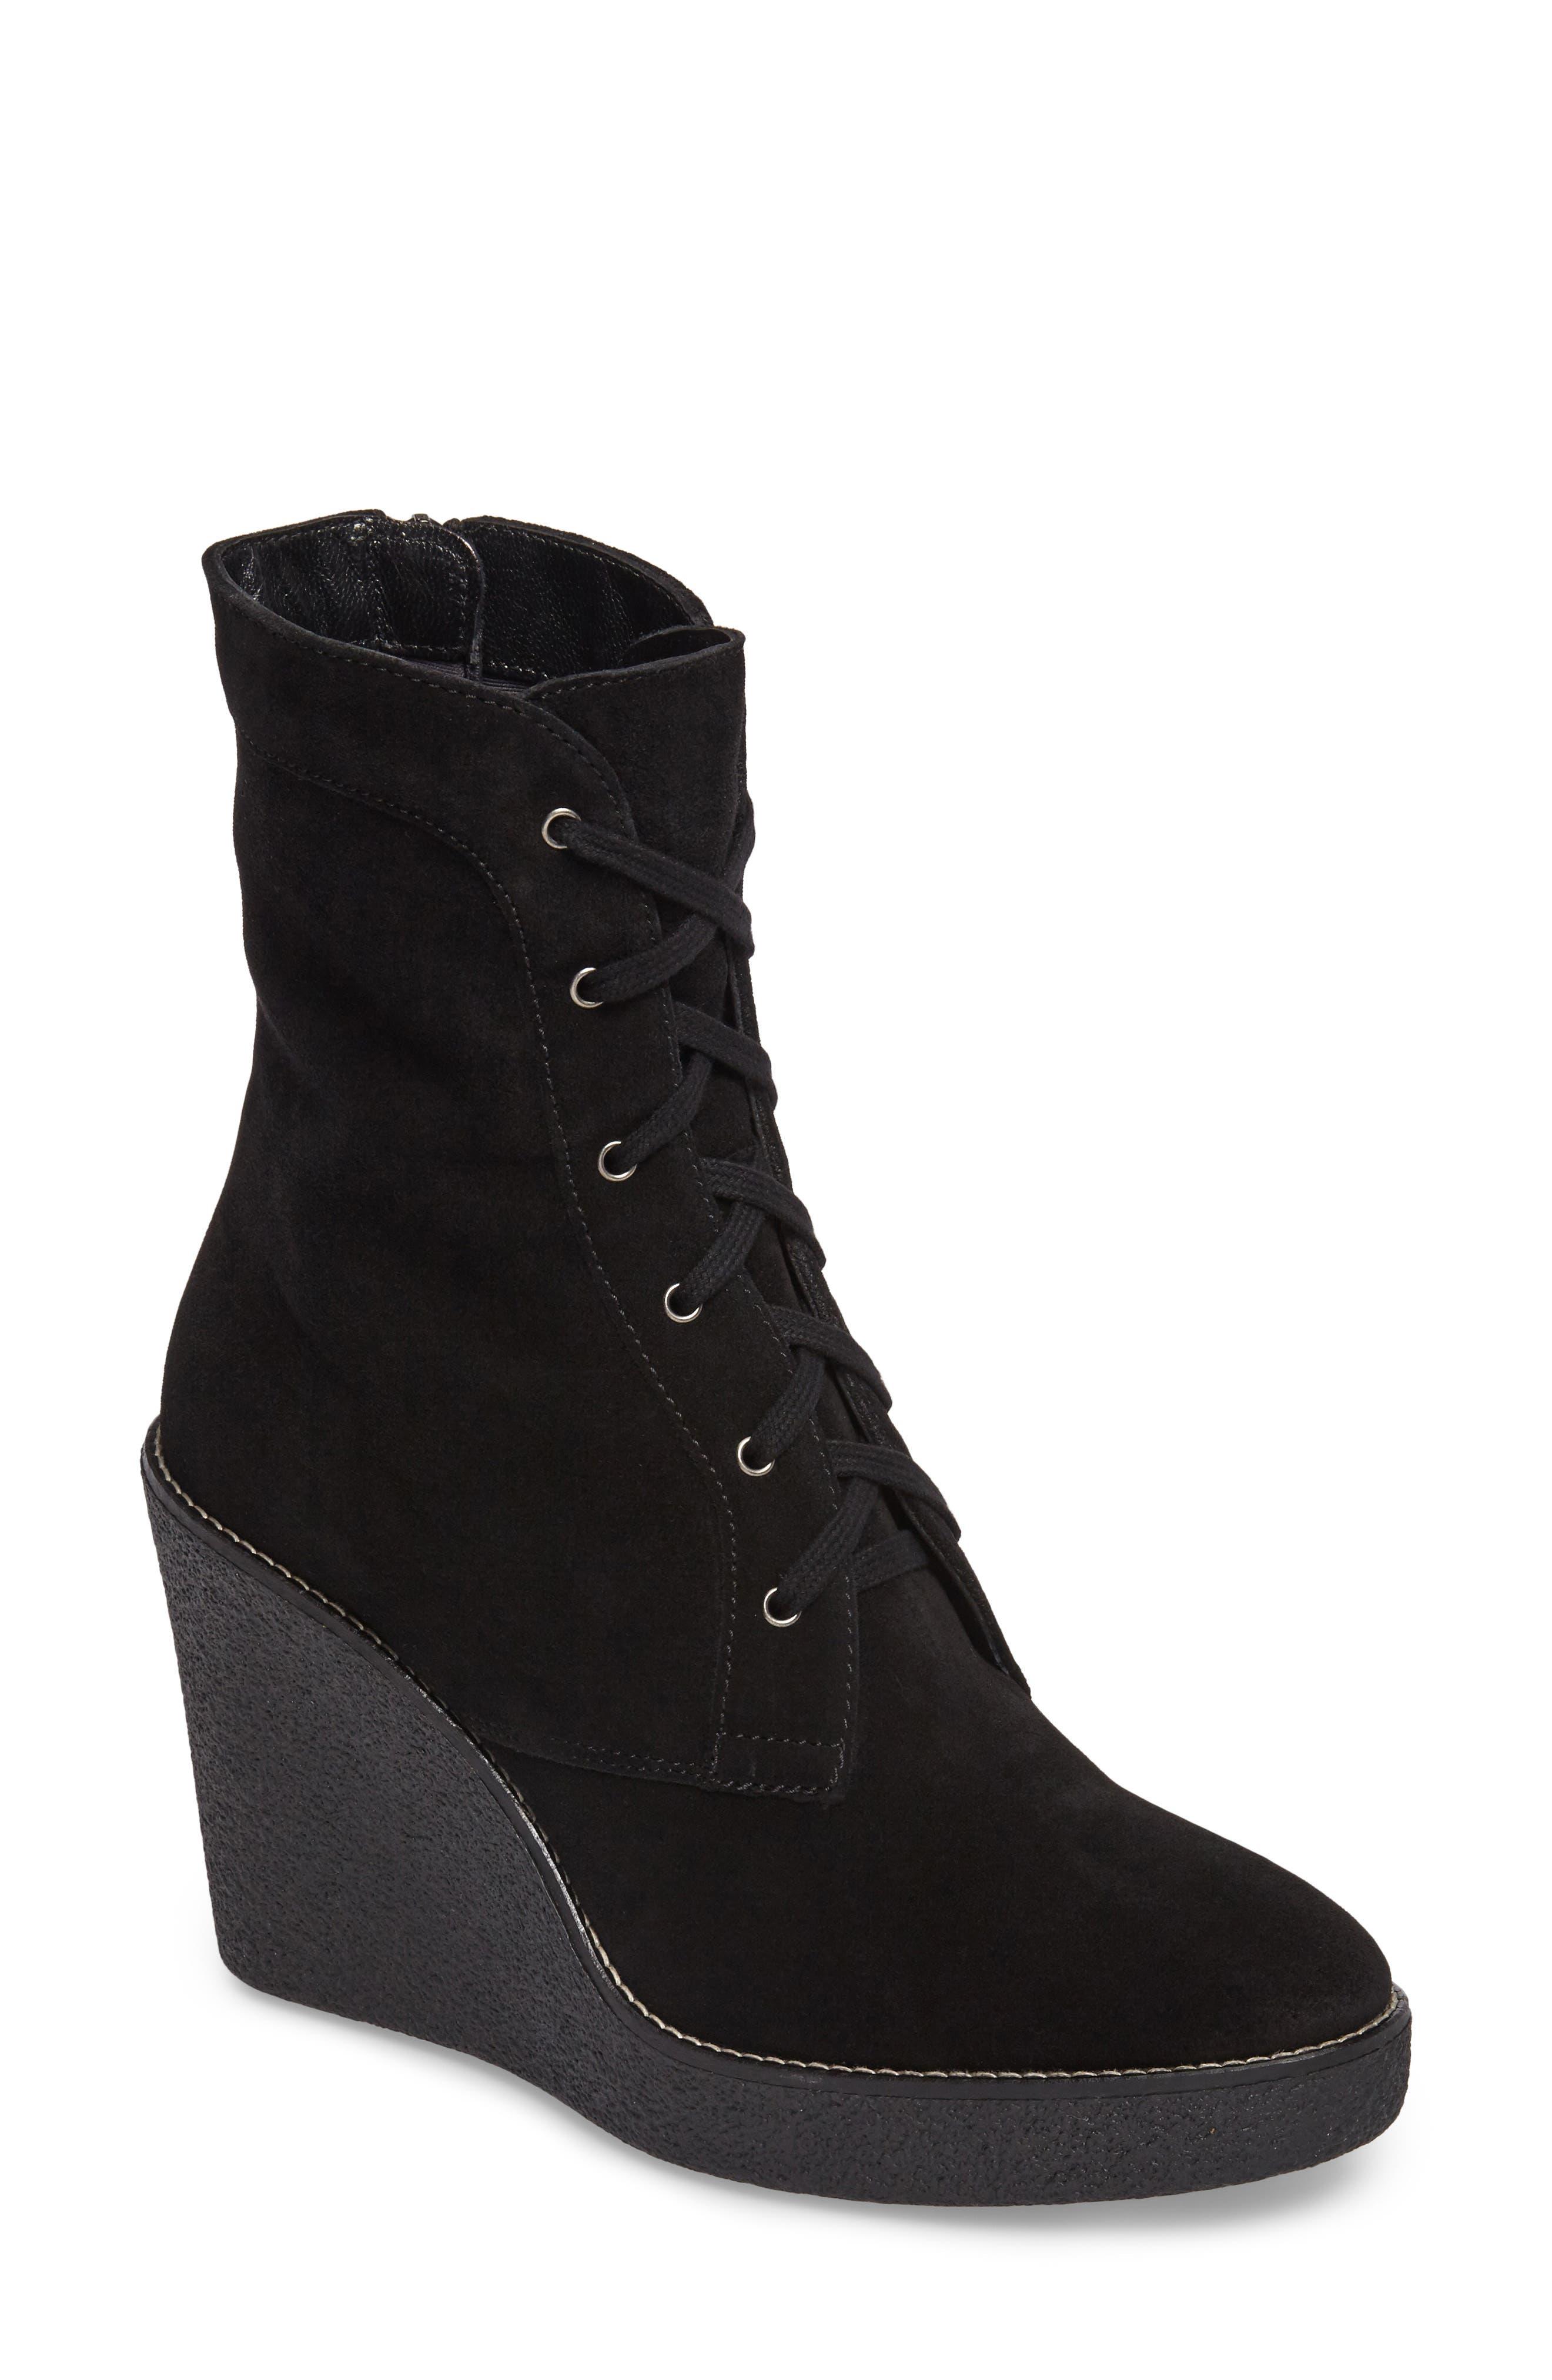 Viviann Weatherproof Wedge Boot,                         Main,                         color, 001